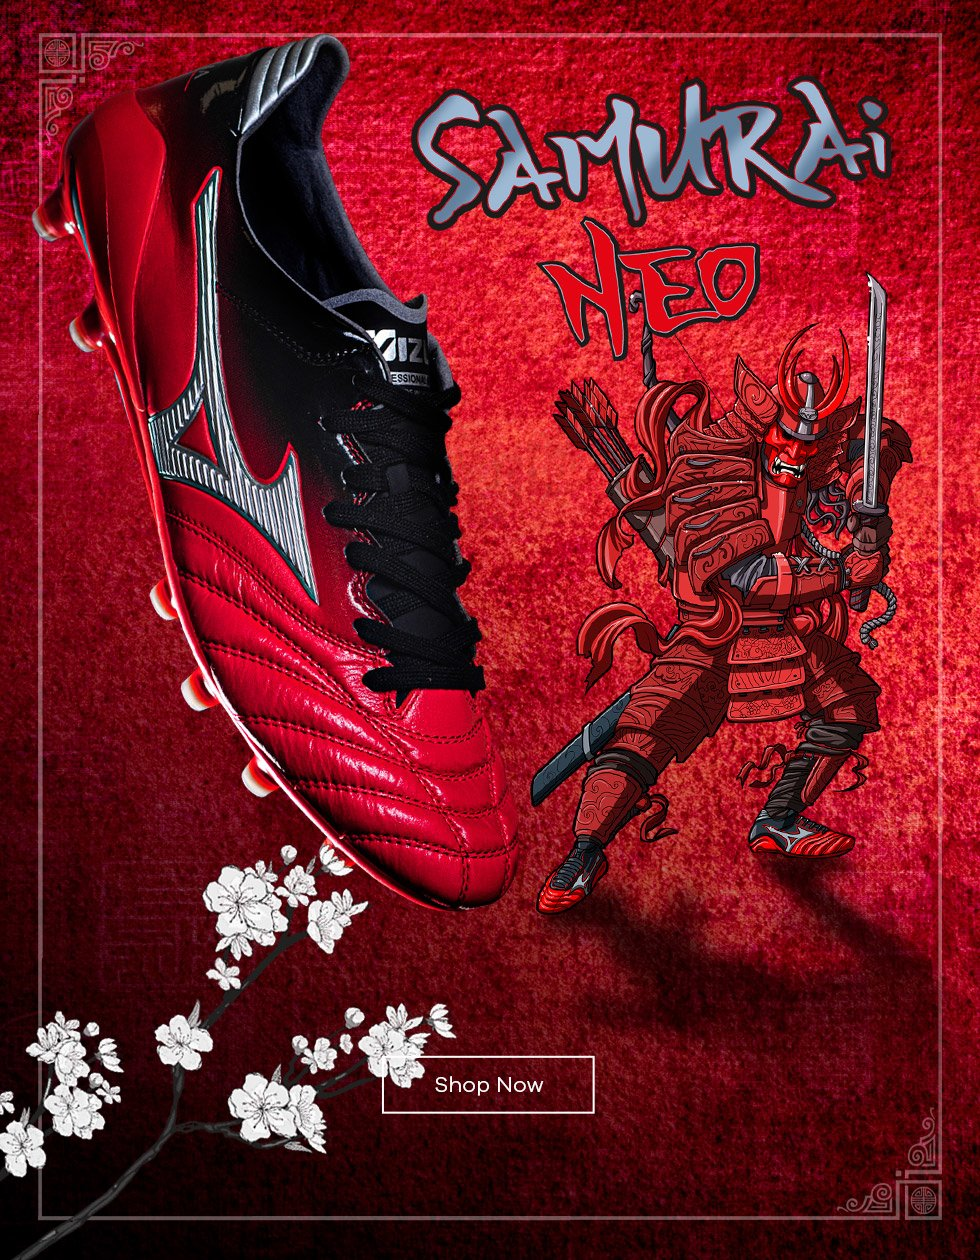 Lovell Soccer – Football Boots, Shirts, Training & Coaching